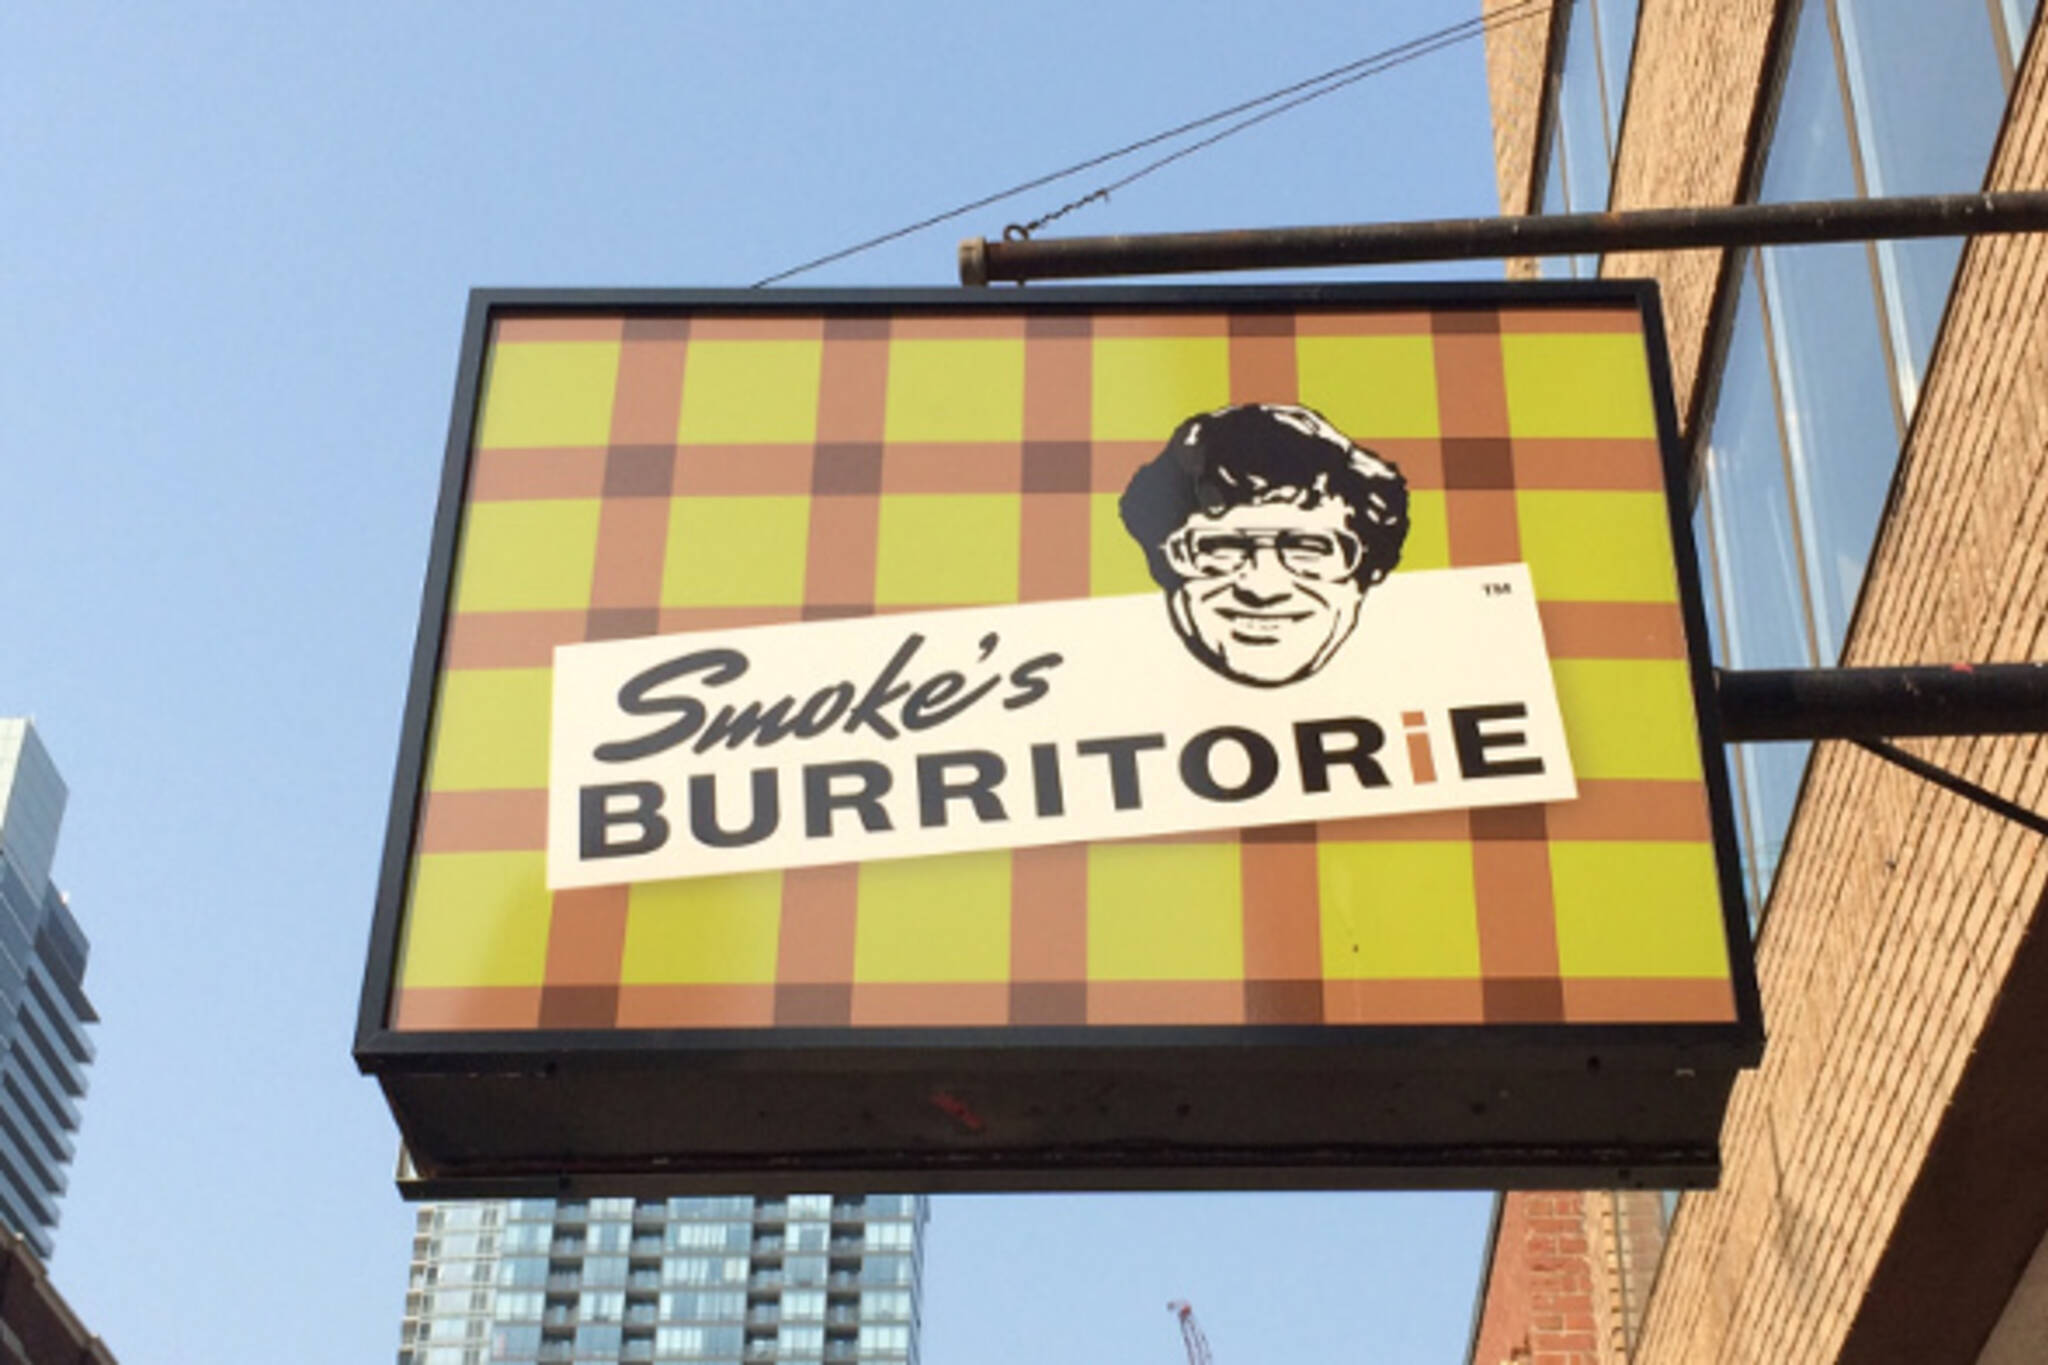 Smokes Burritorie